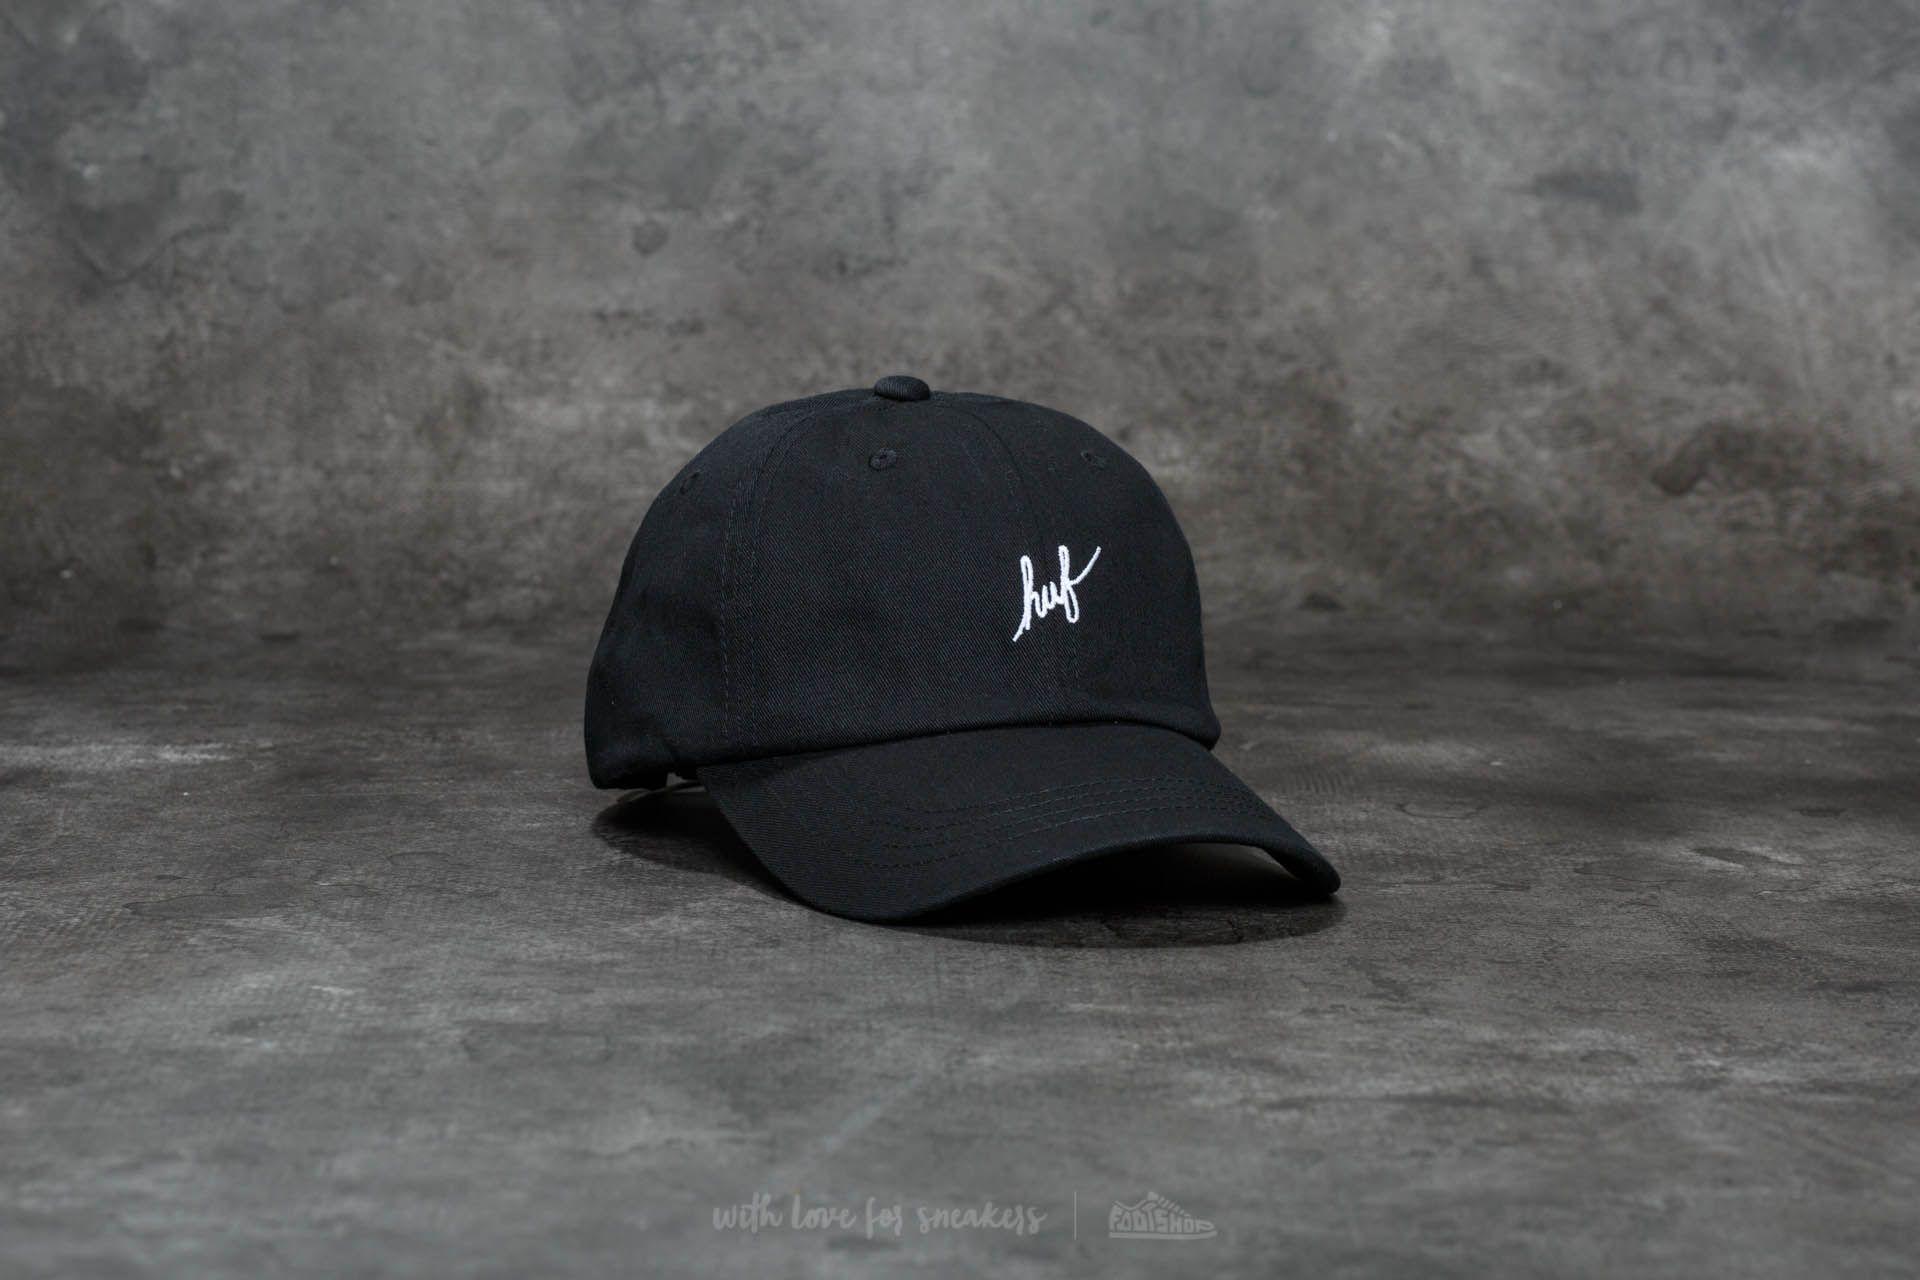 842c2db44d7 Lyst - Huf Script Logo Curve Brim Cap Black  White in Black for Men